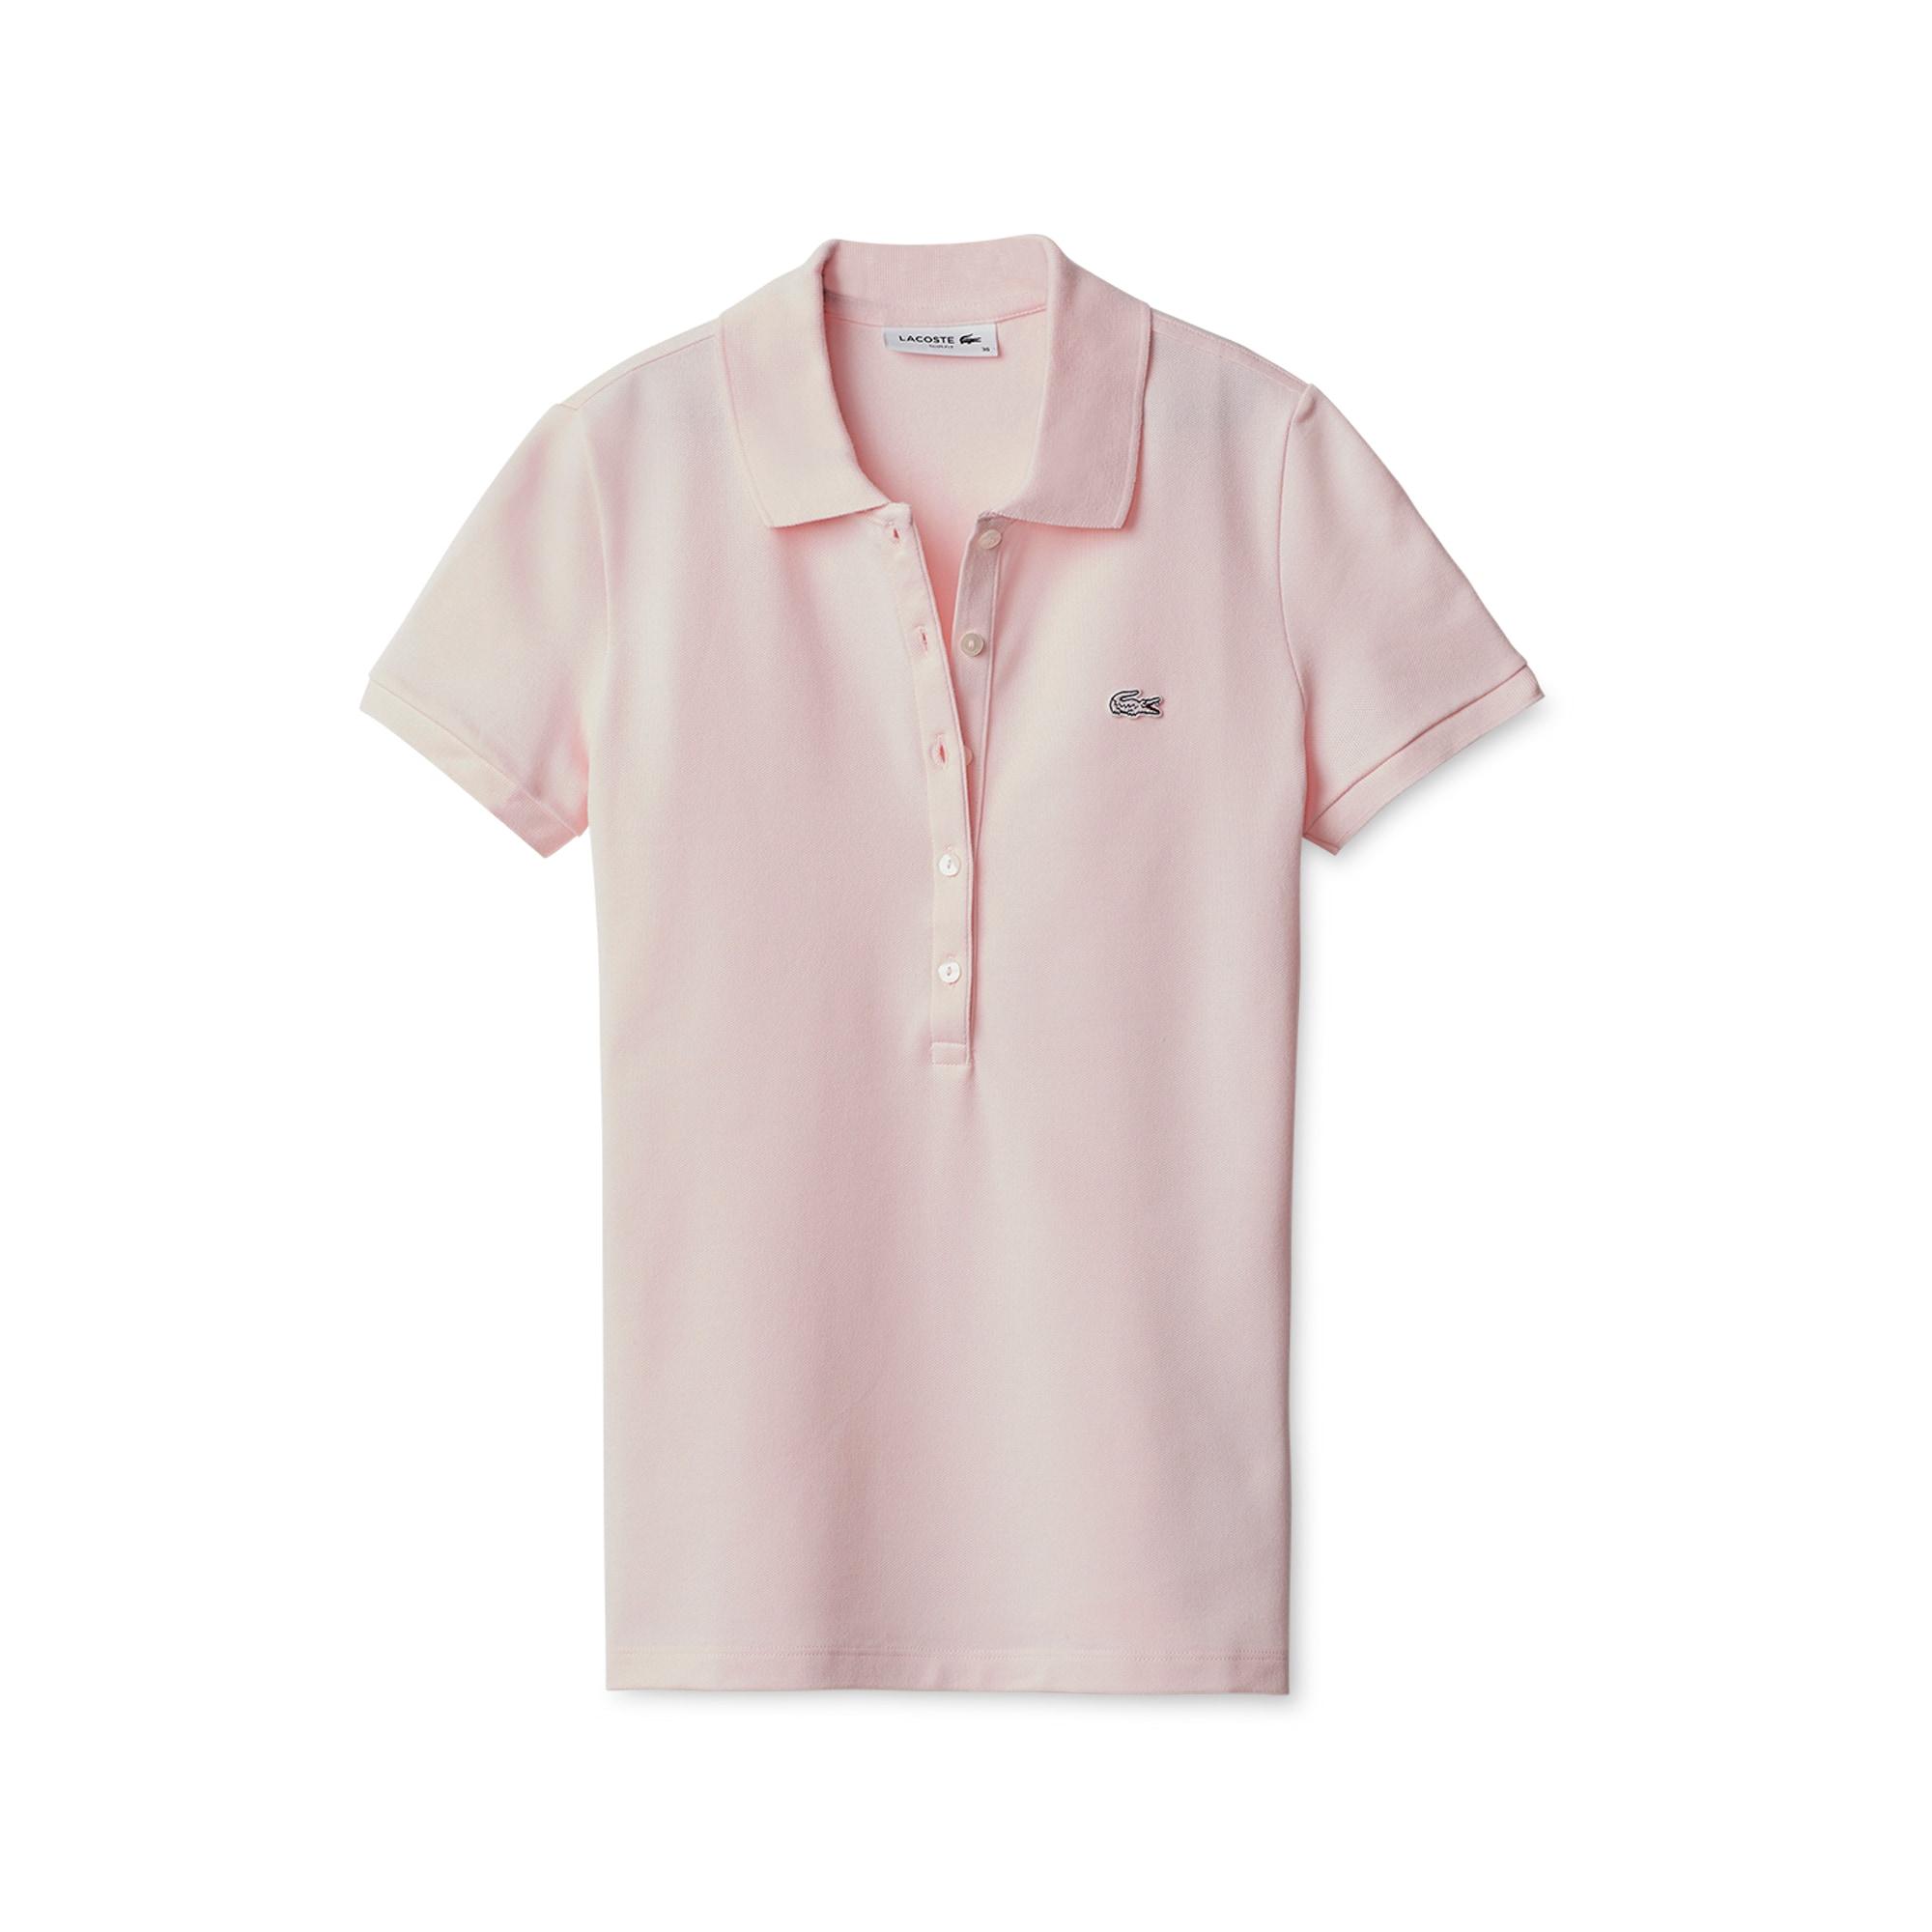 4fe89e4032 Camisas polo para mulheres  manga longa e sem manga